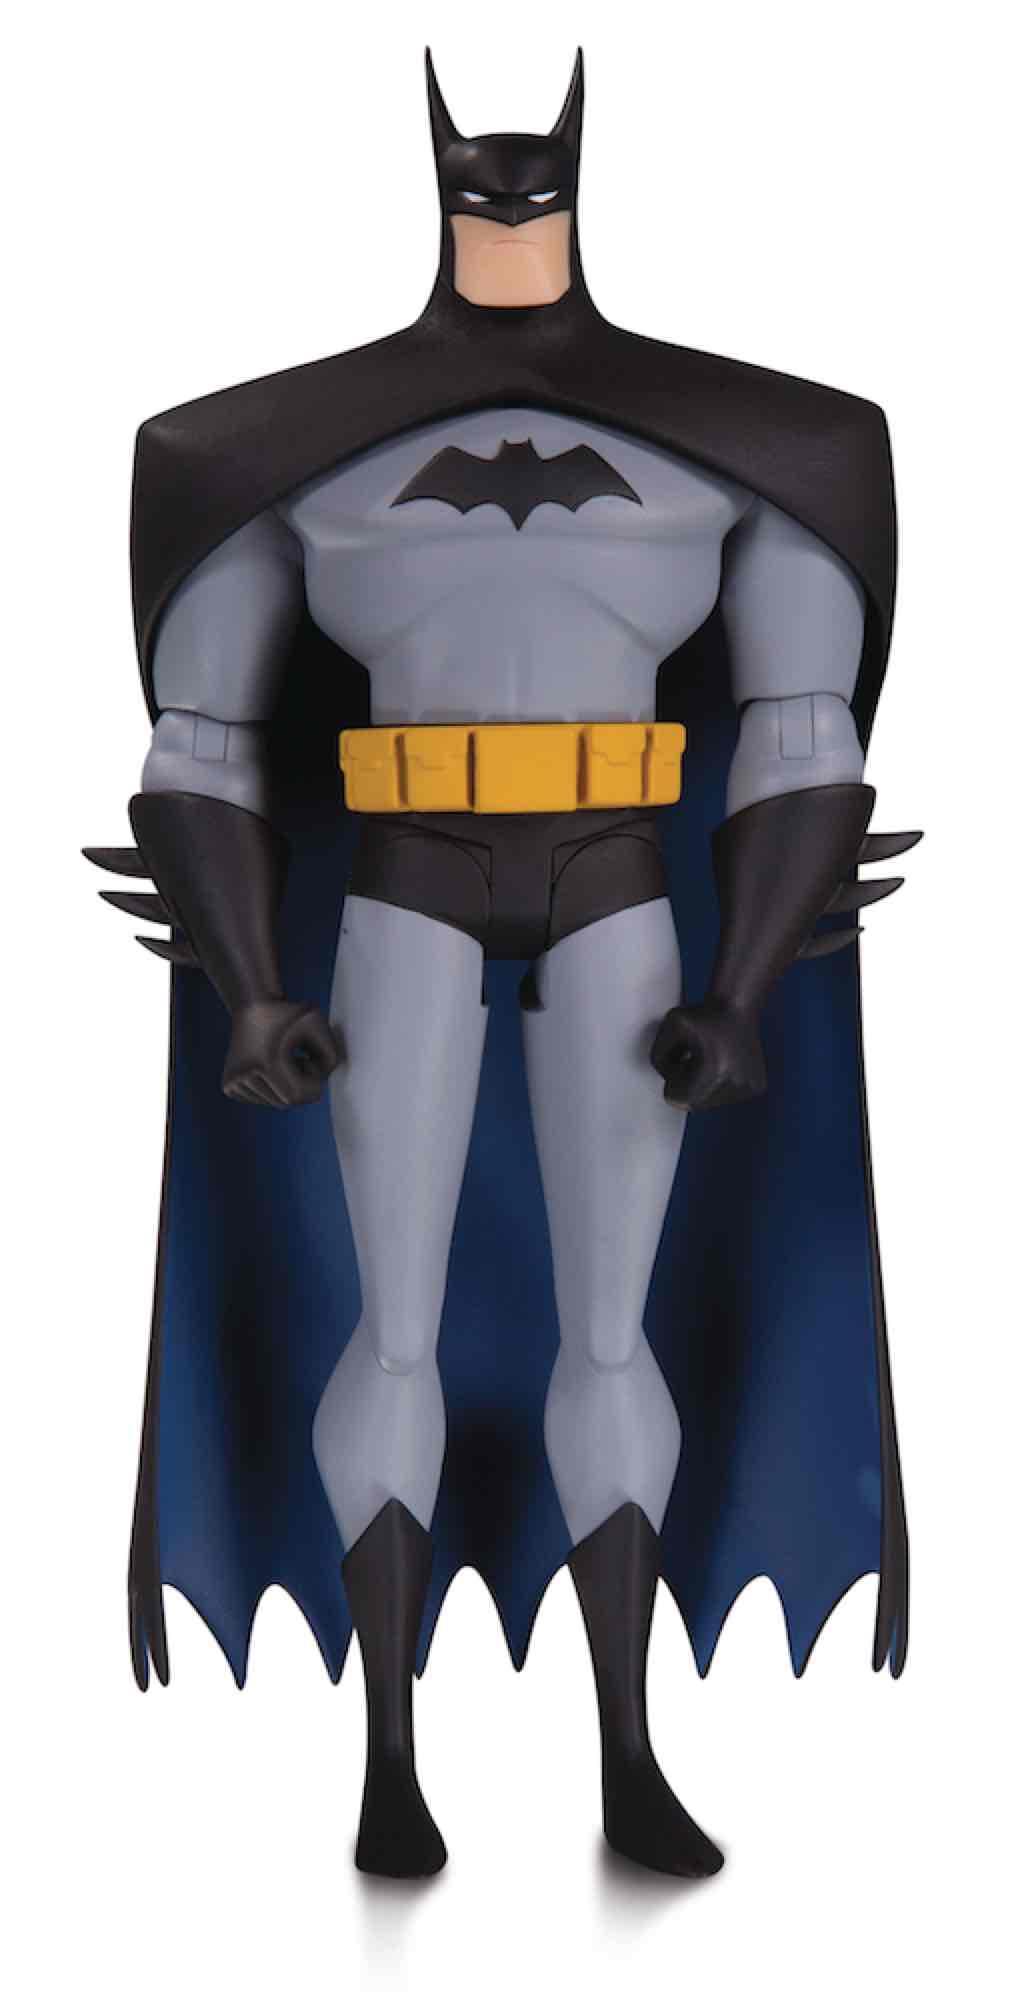 BATMAN FIGURA 16 CM JUSTICE LEAGUE ANIMATED ACTION FIGURE DC UNIVERSE